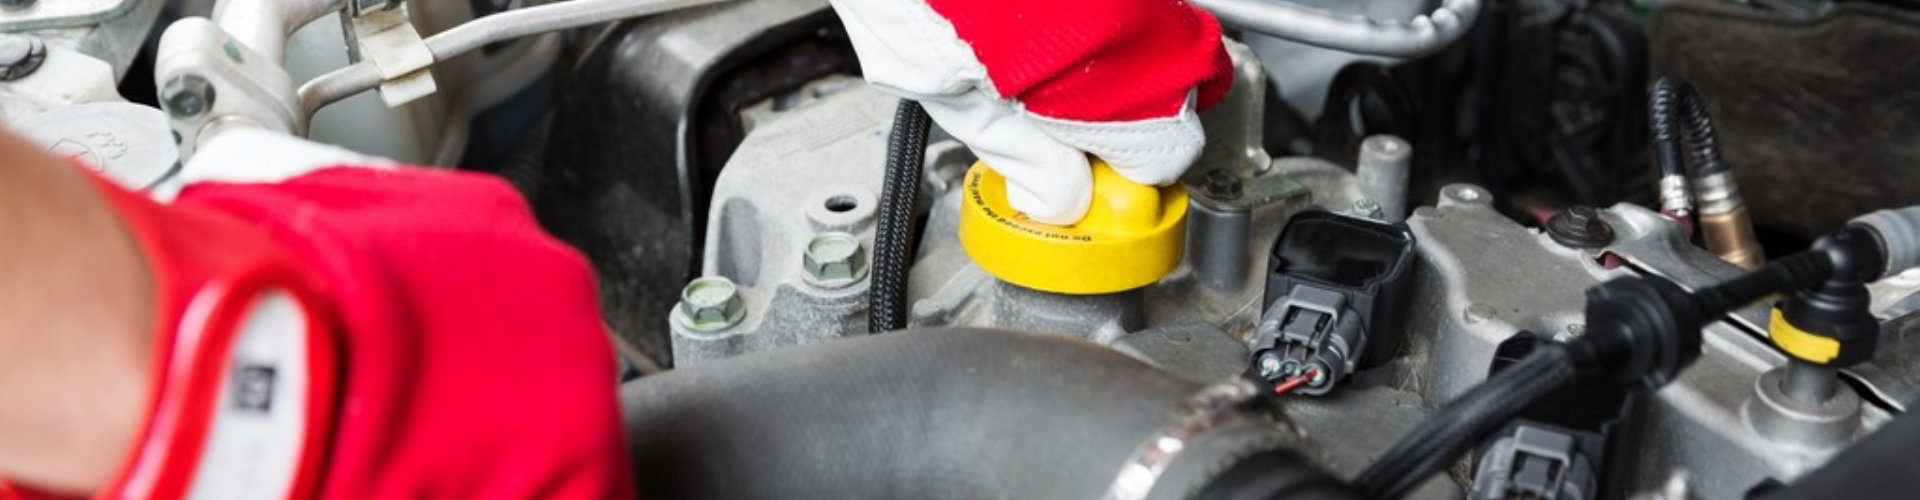 mechanic check vehicle engine